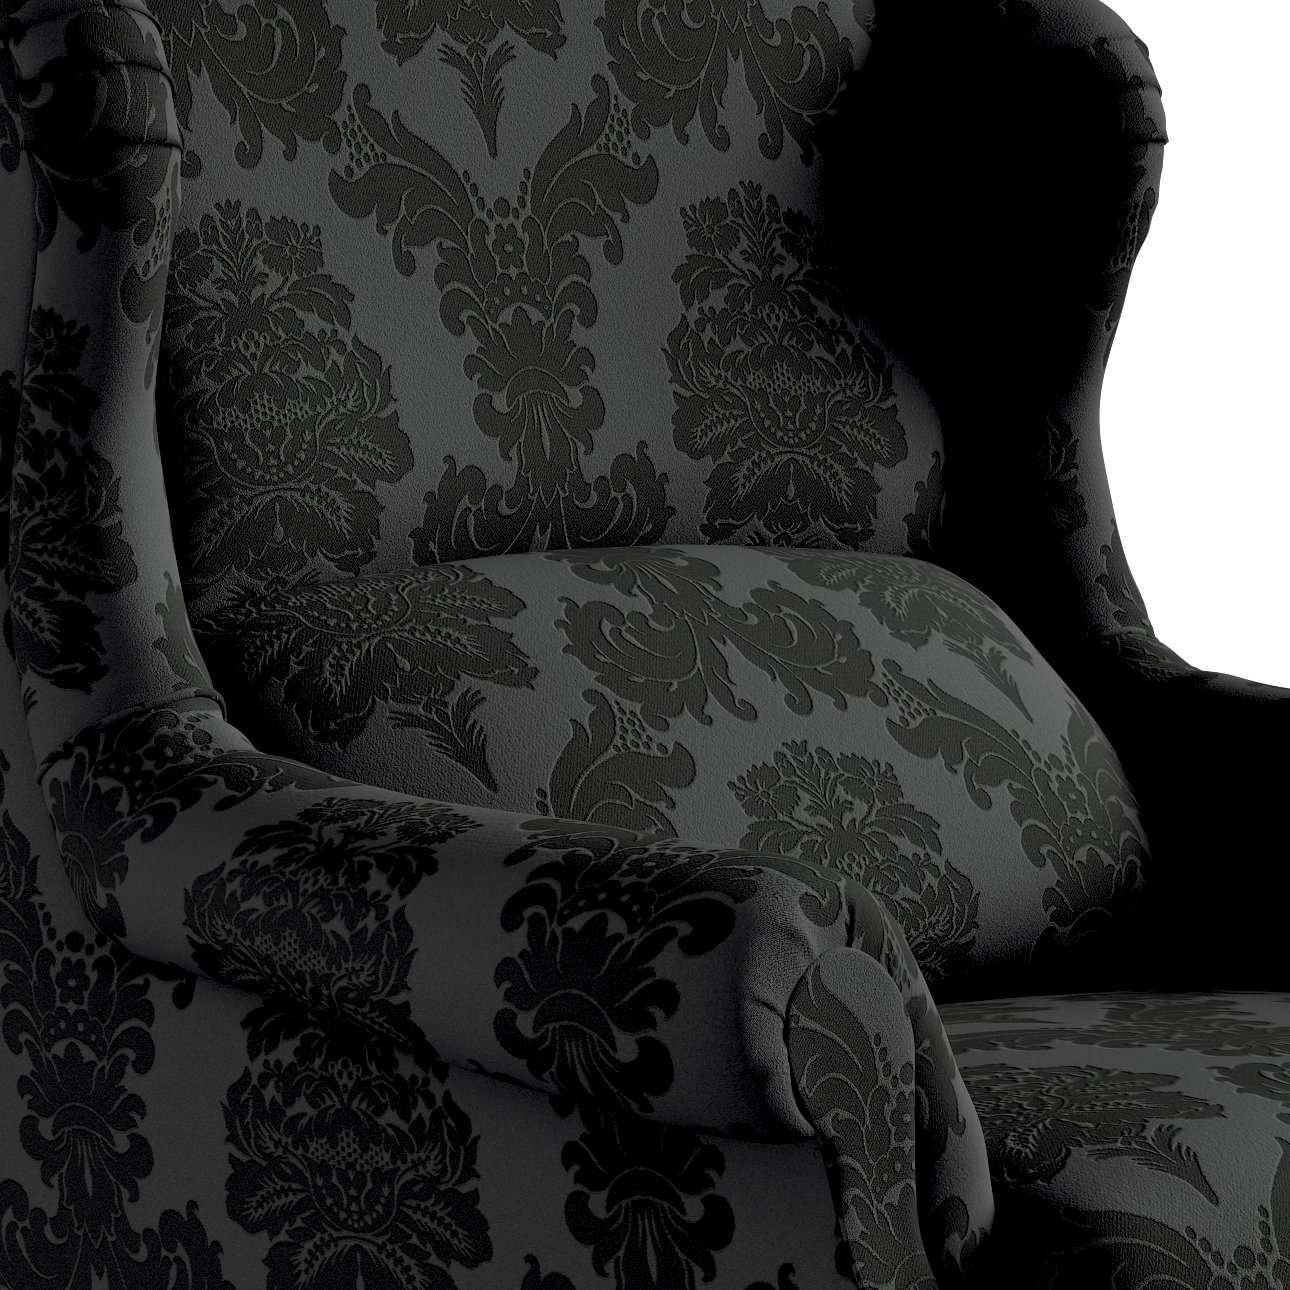 Fotel Unique w kolekcji Damasco, tkanina: 613-32